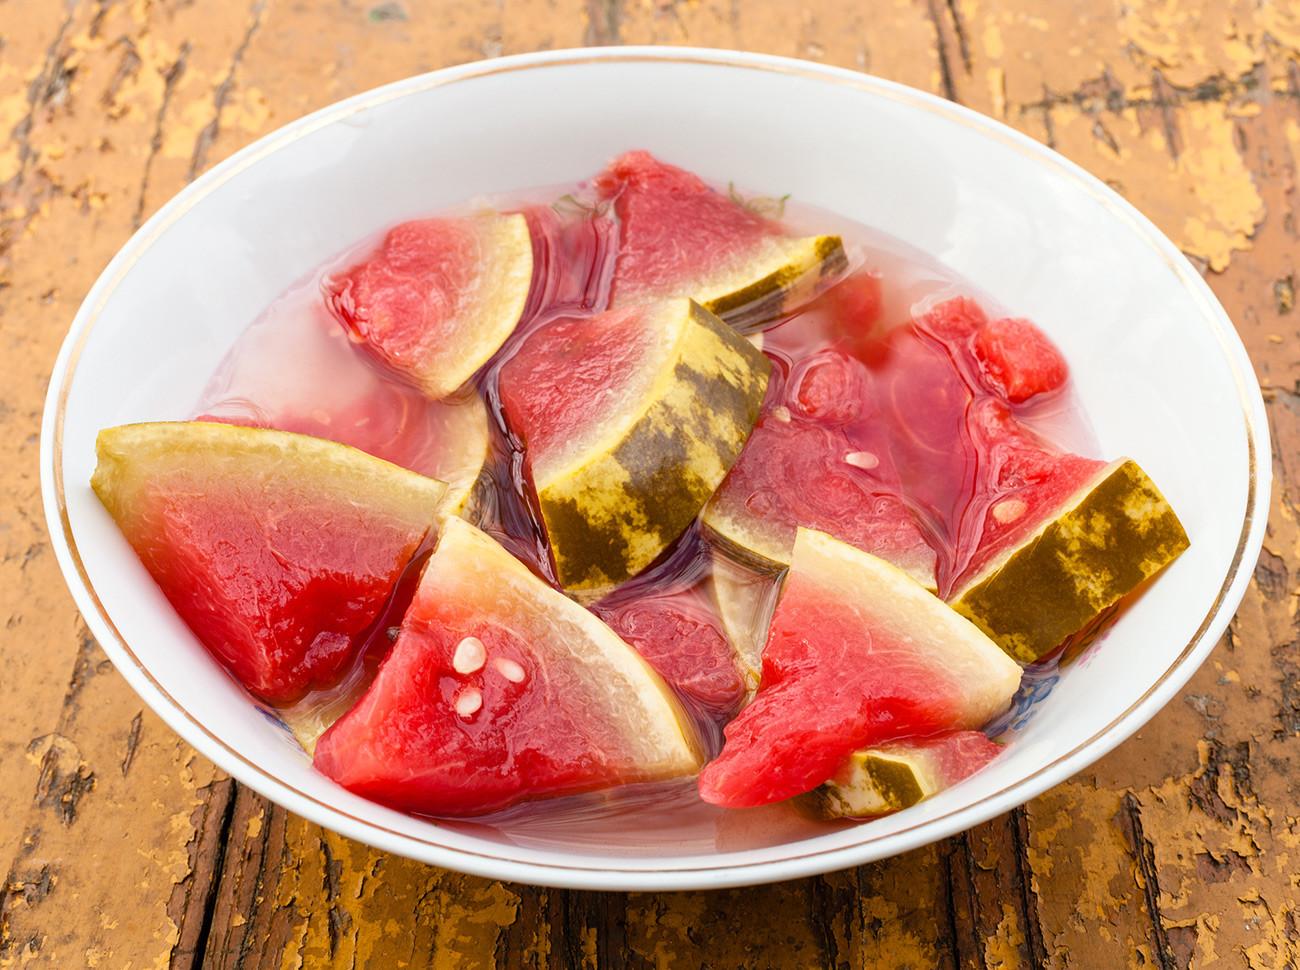 Gesalzene Wassermelone